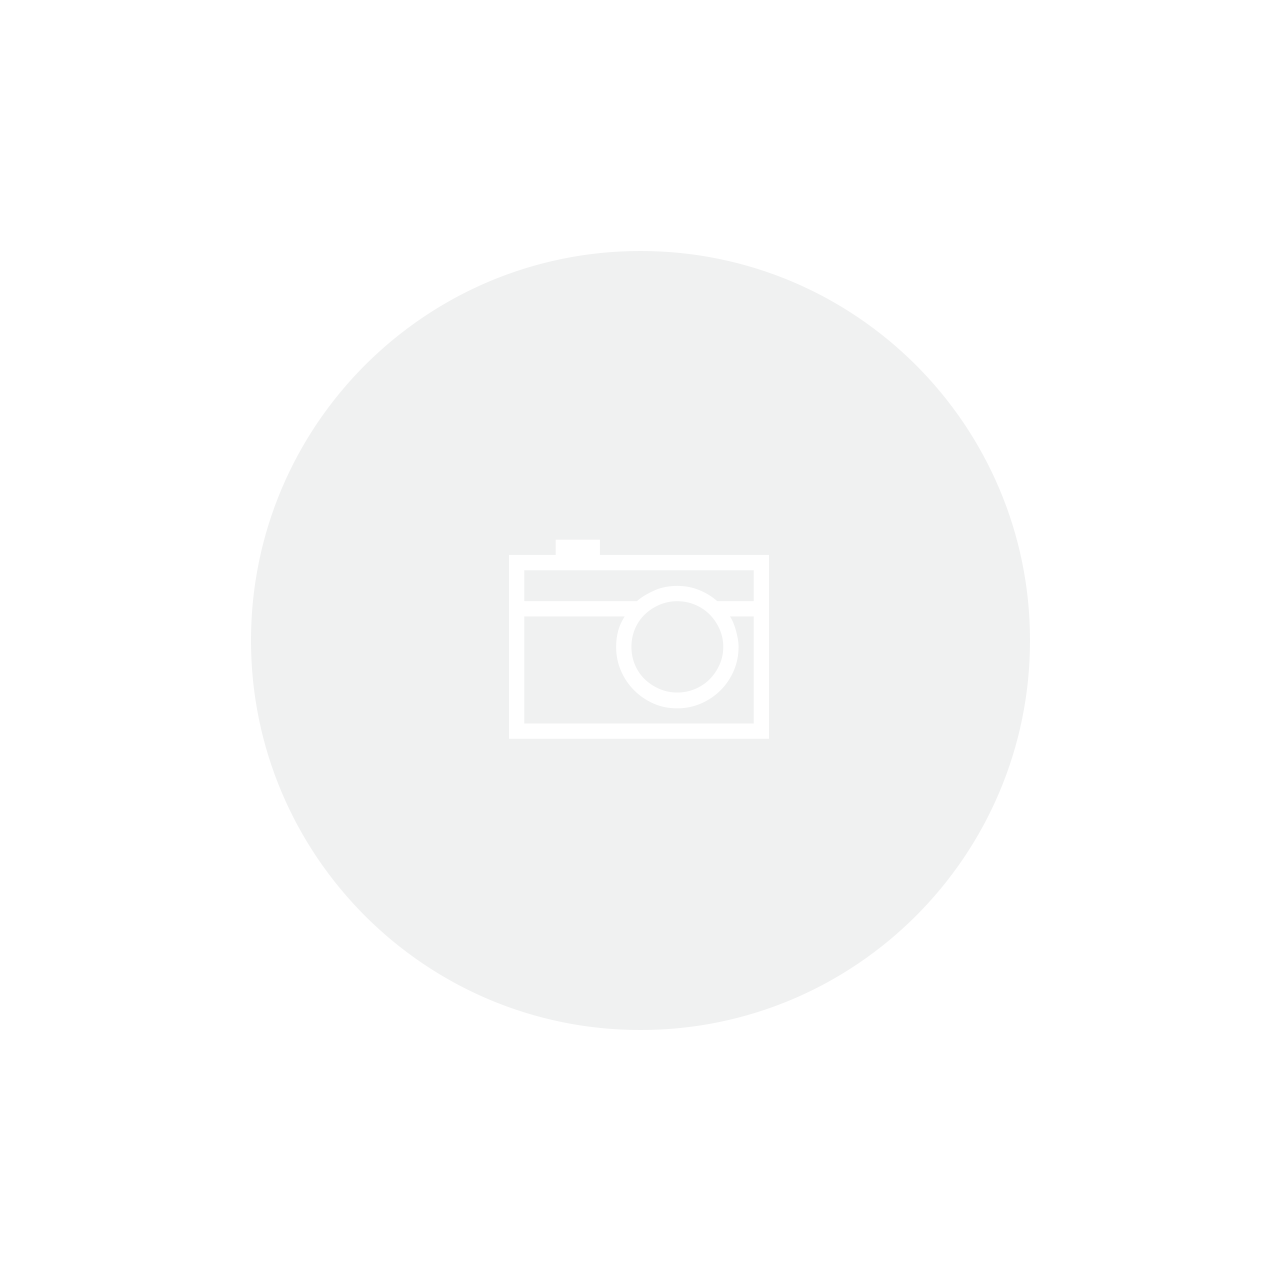 Assadeira com Grelha 34Cm Starflon Brasil Tramontina